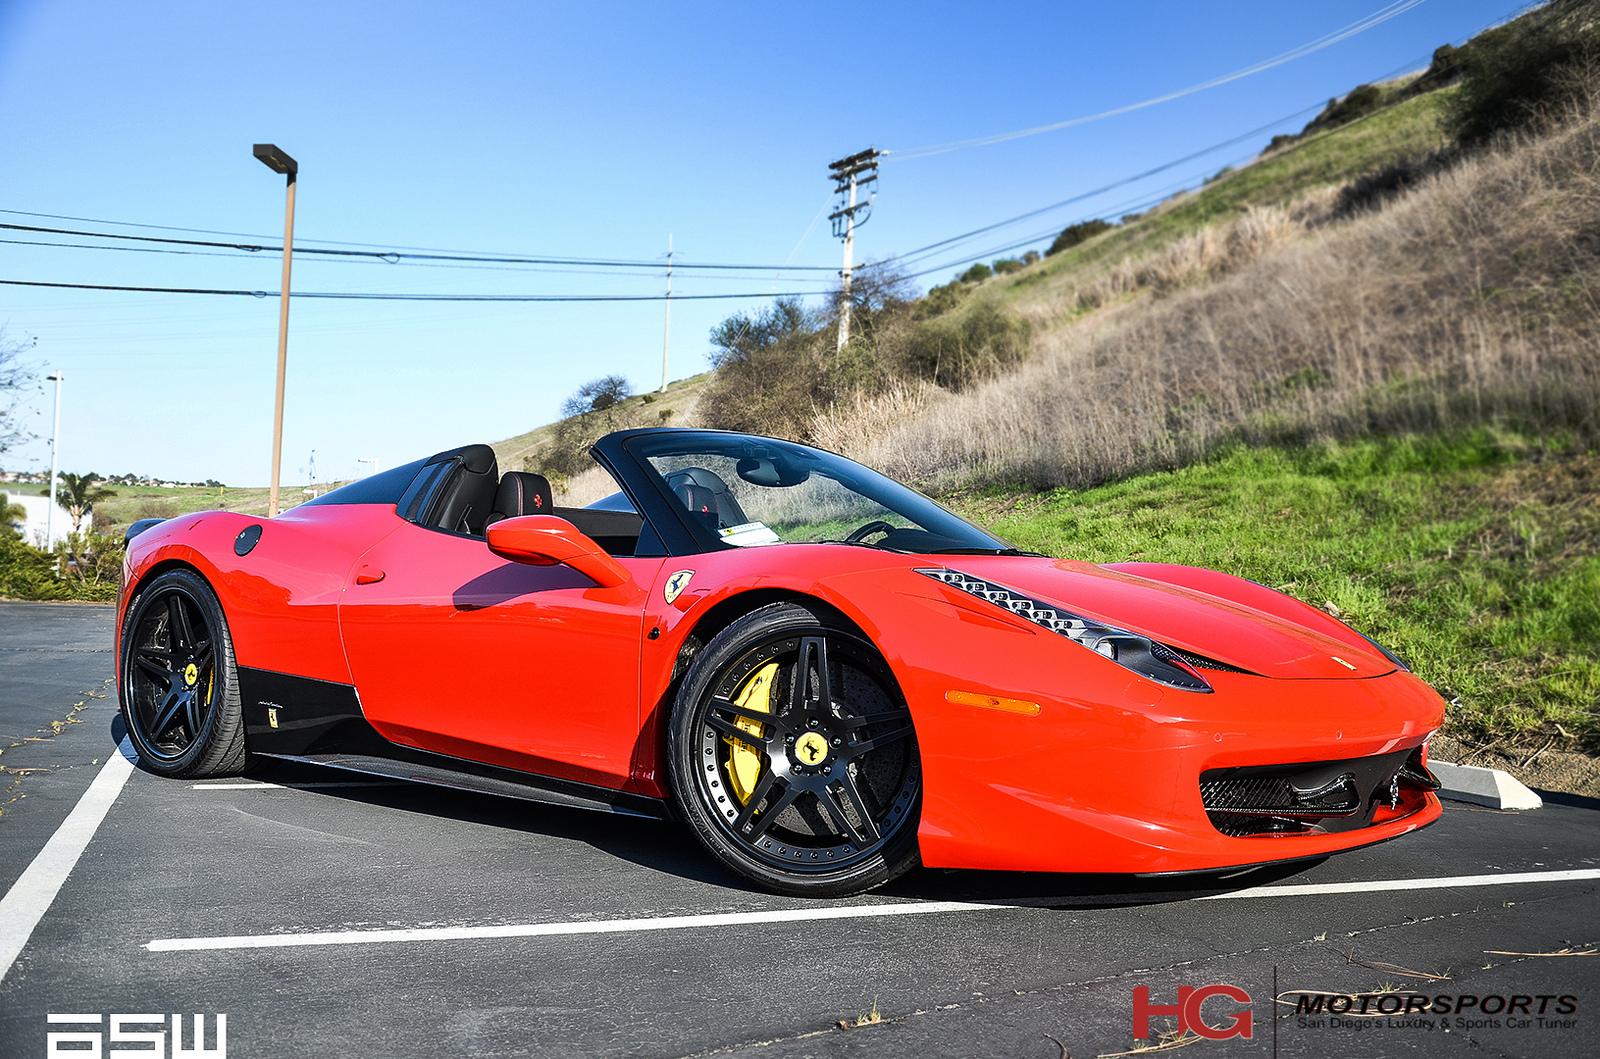 http://www.gtspirit.com/wp-content/gallery/ferrari-458-spider-by-hg-motorsports-and-novitec-rosso/8495683254_dd2c38505a_h.jpg